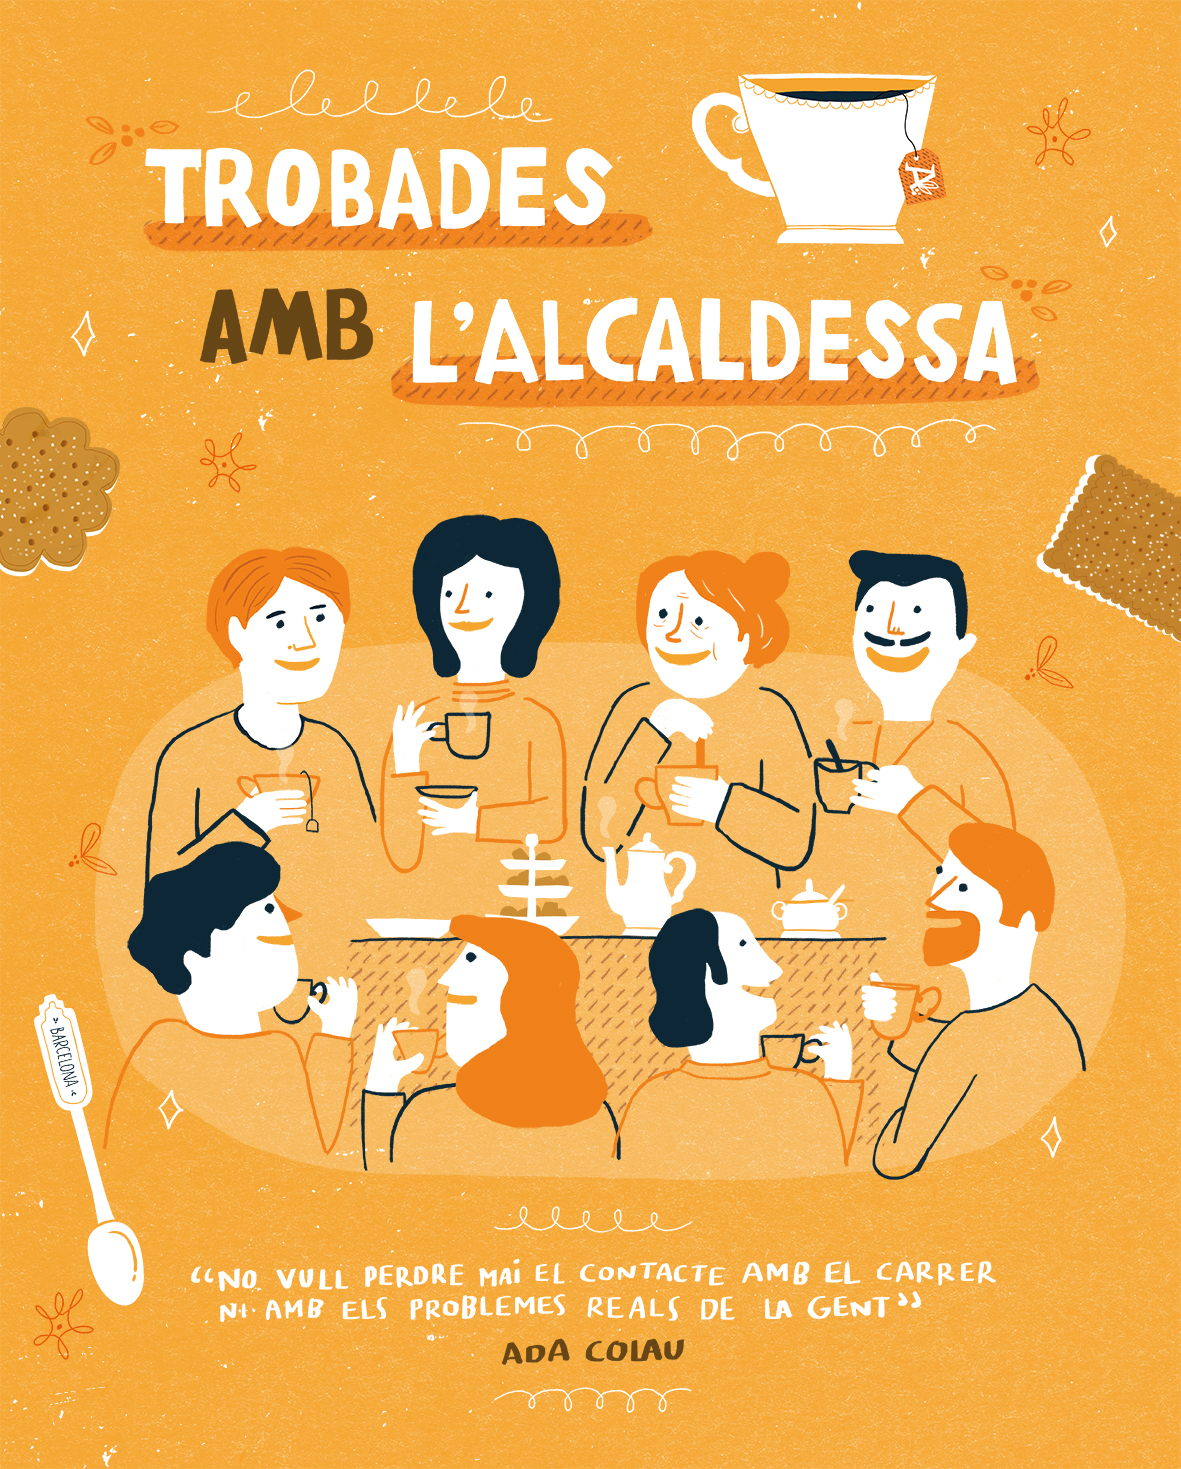 alcaldessa_adacolau_juliasolans_3